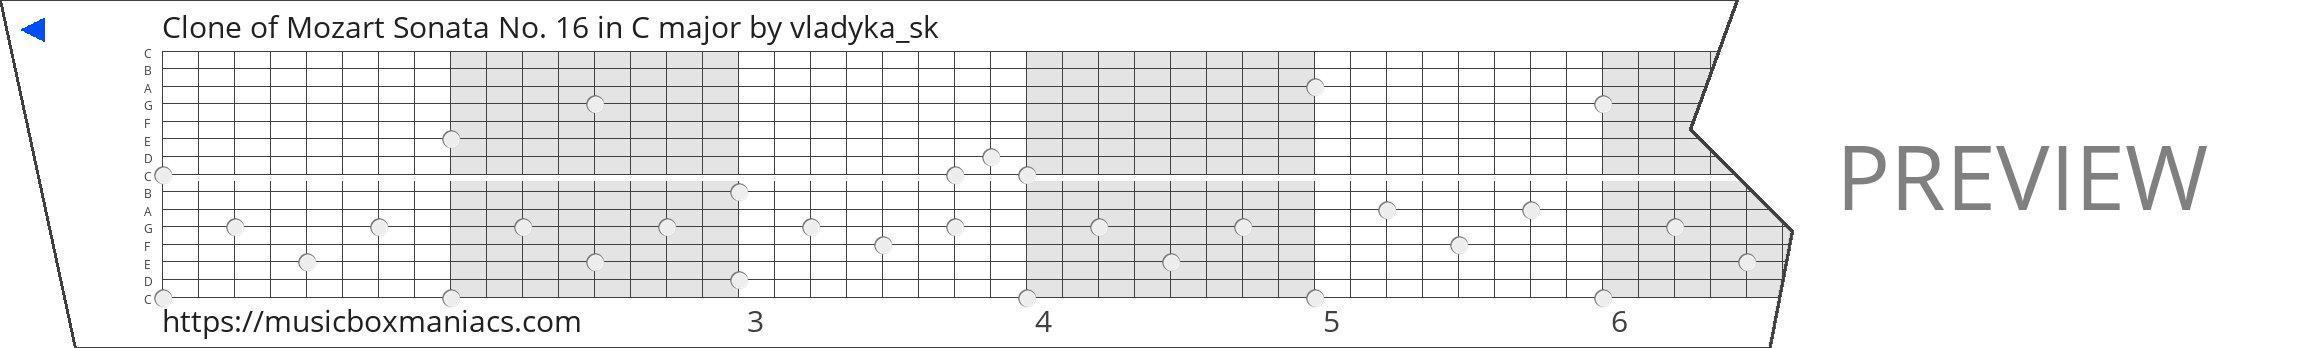 Clone of Mozart Sonata No. 16 in C major 15 note music box paper strip